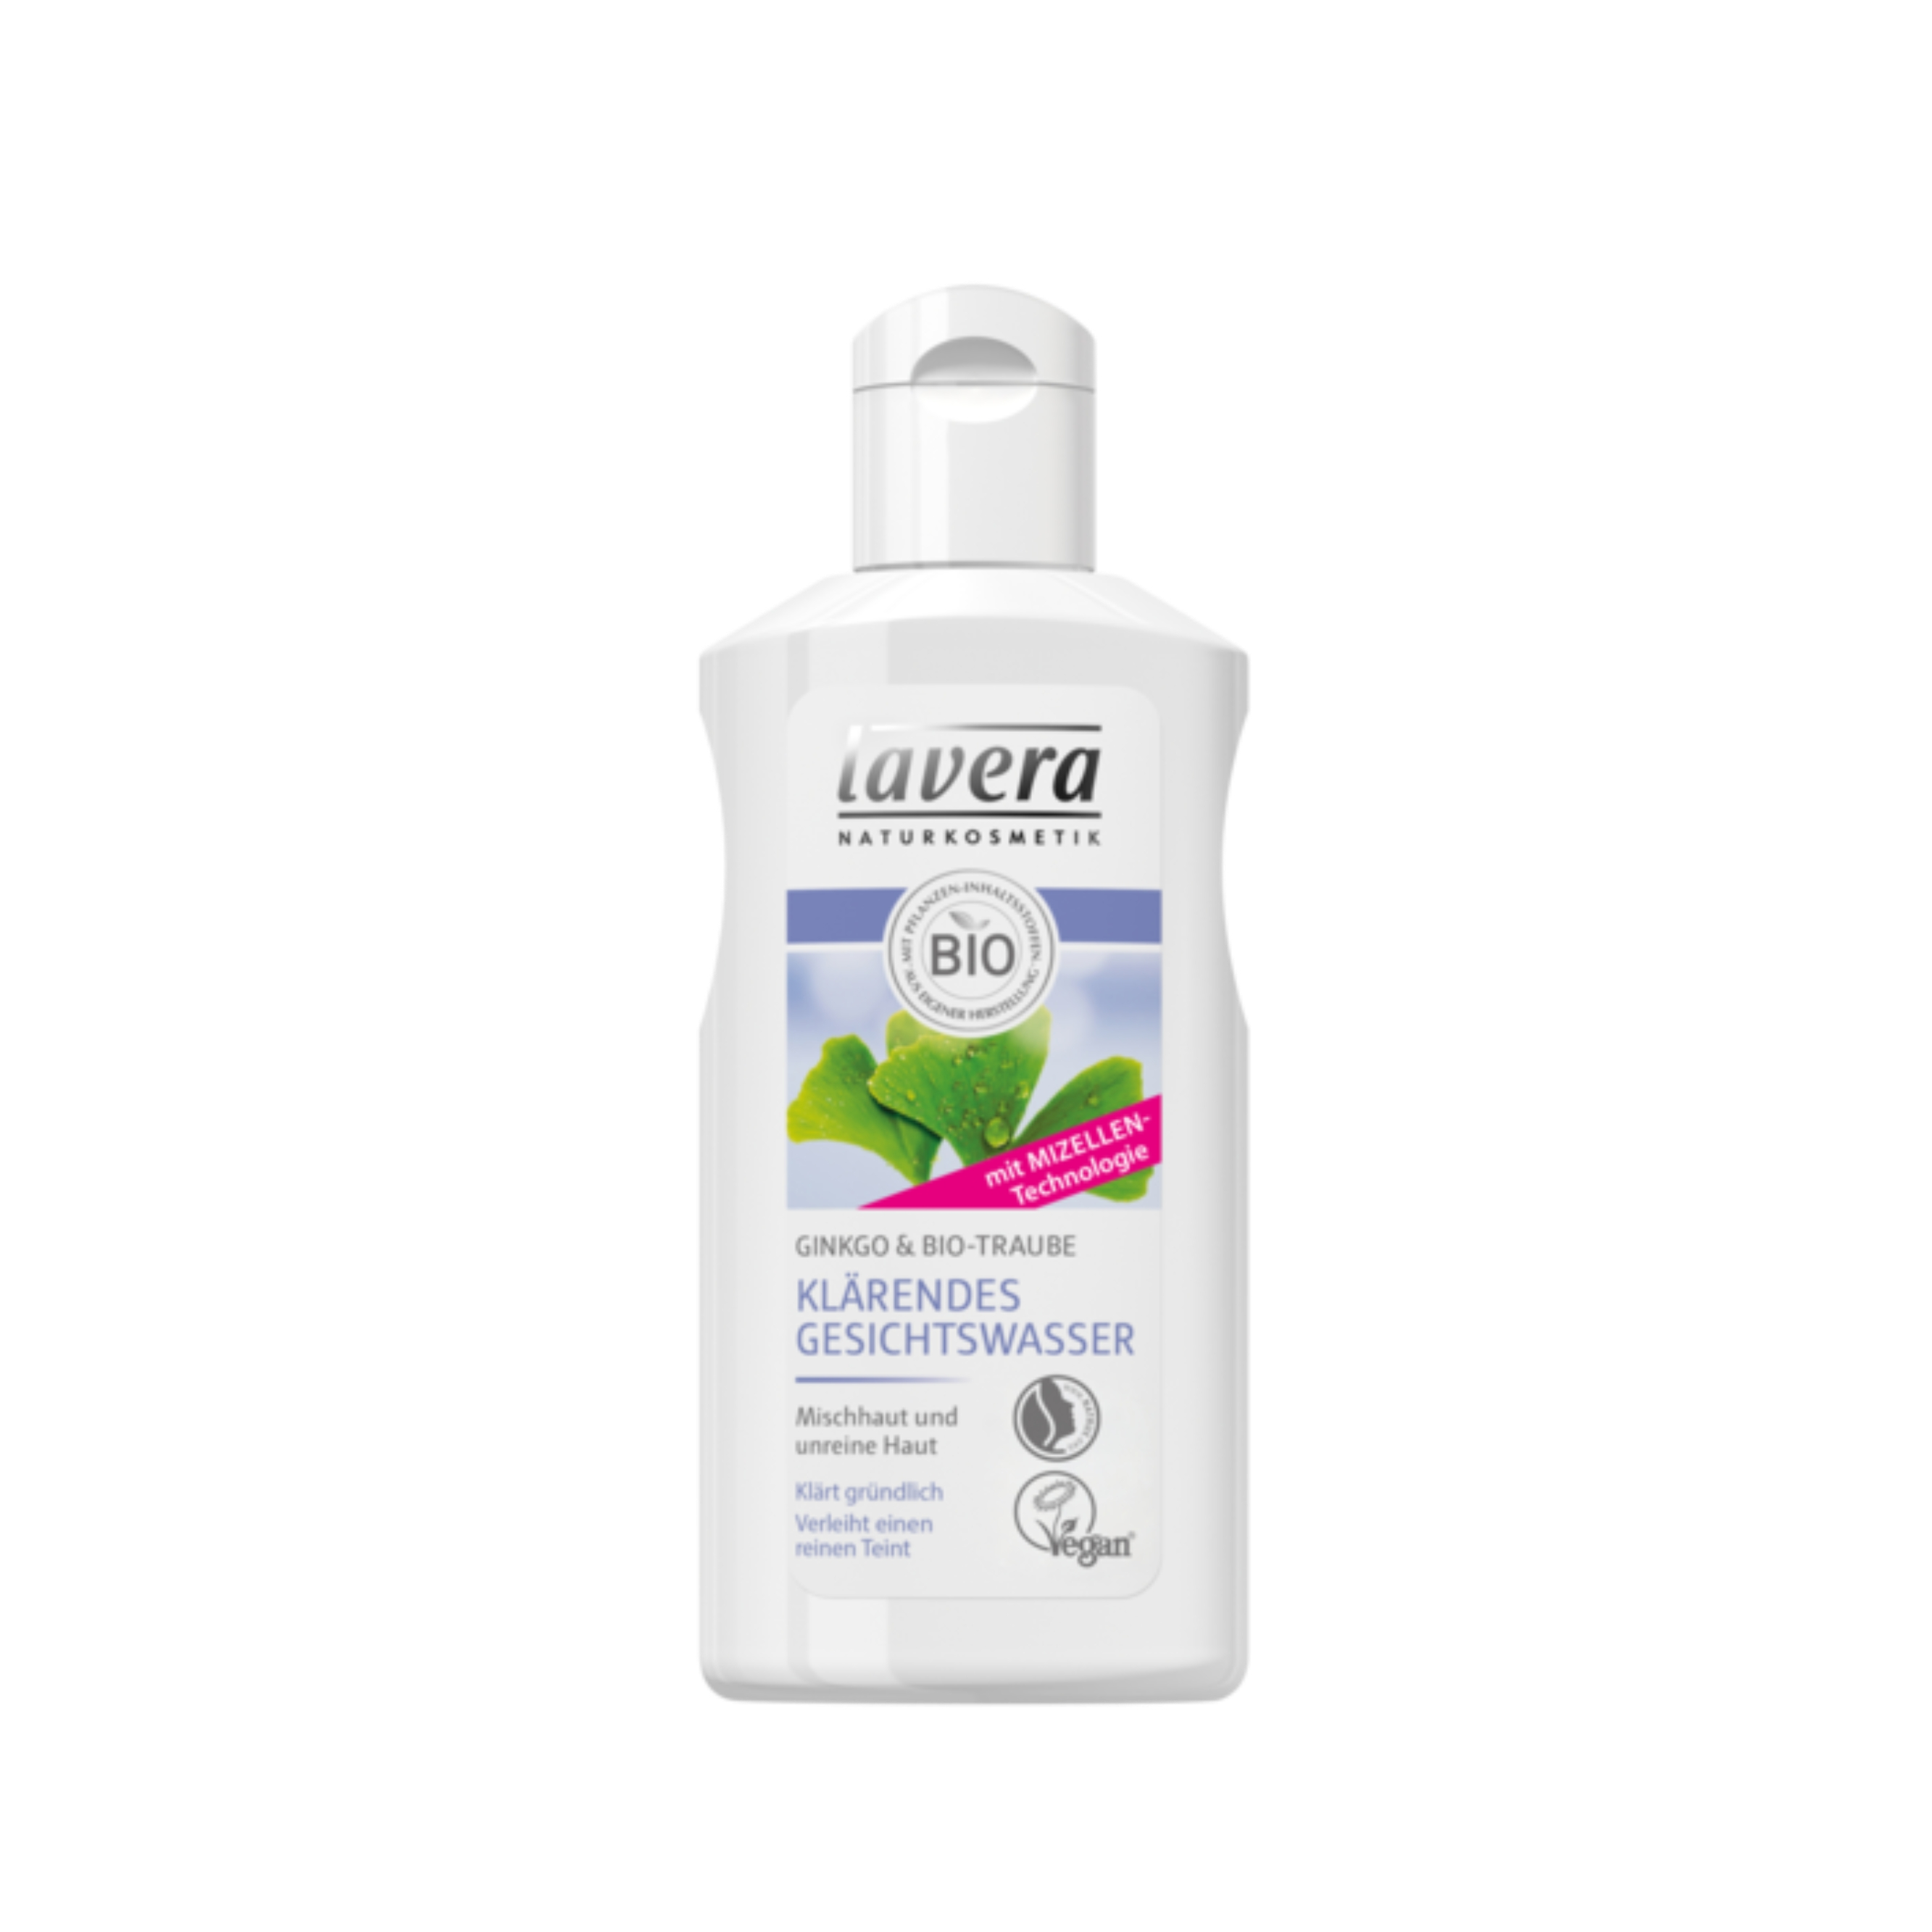 Čistiaca pleťová voda Ginkgo 125 ml Lavera